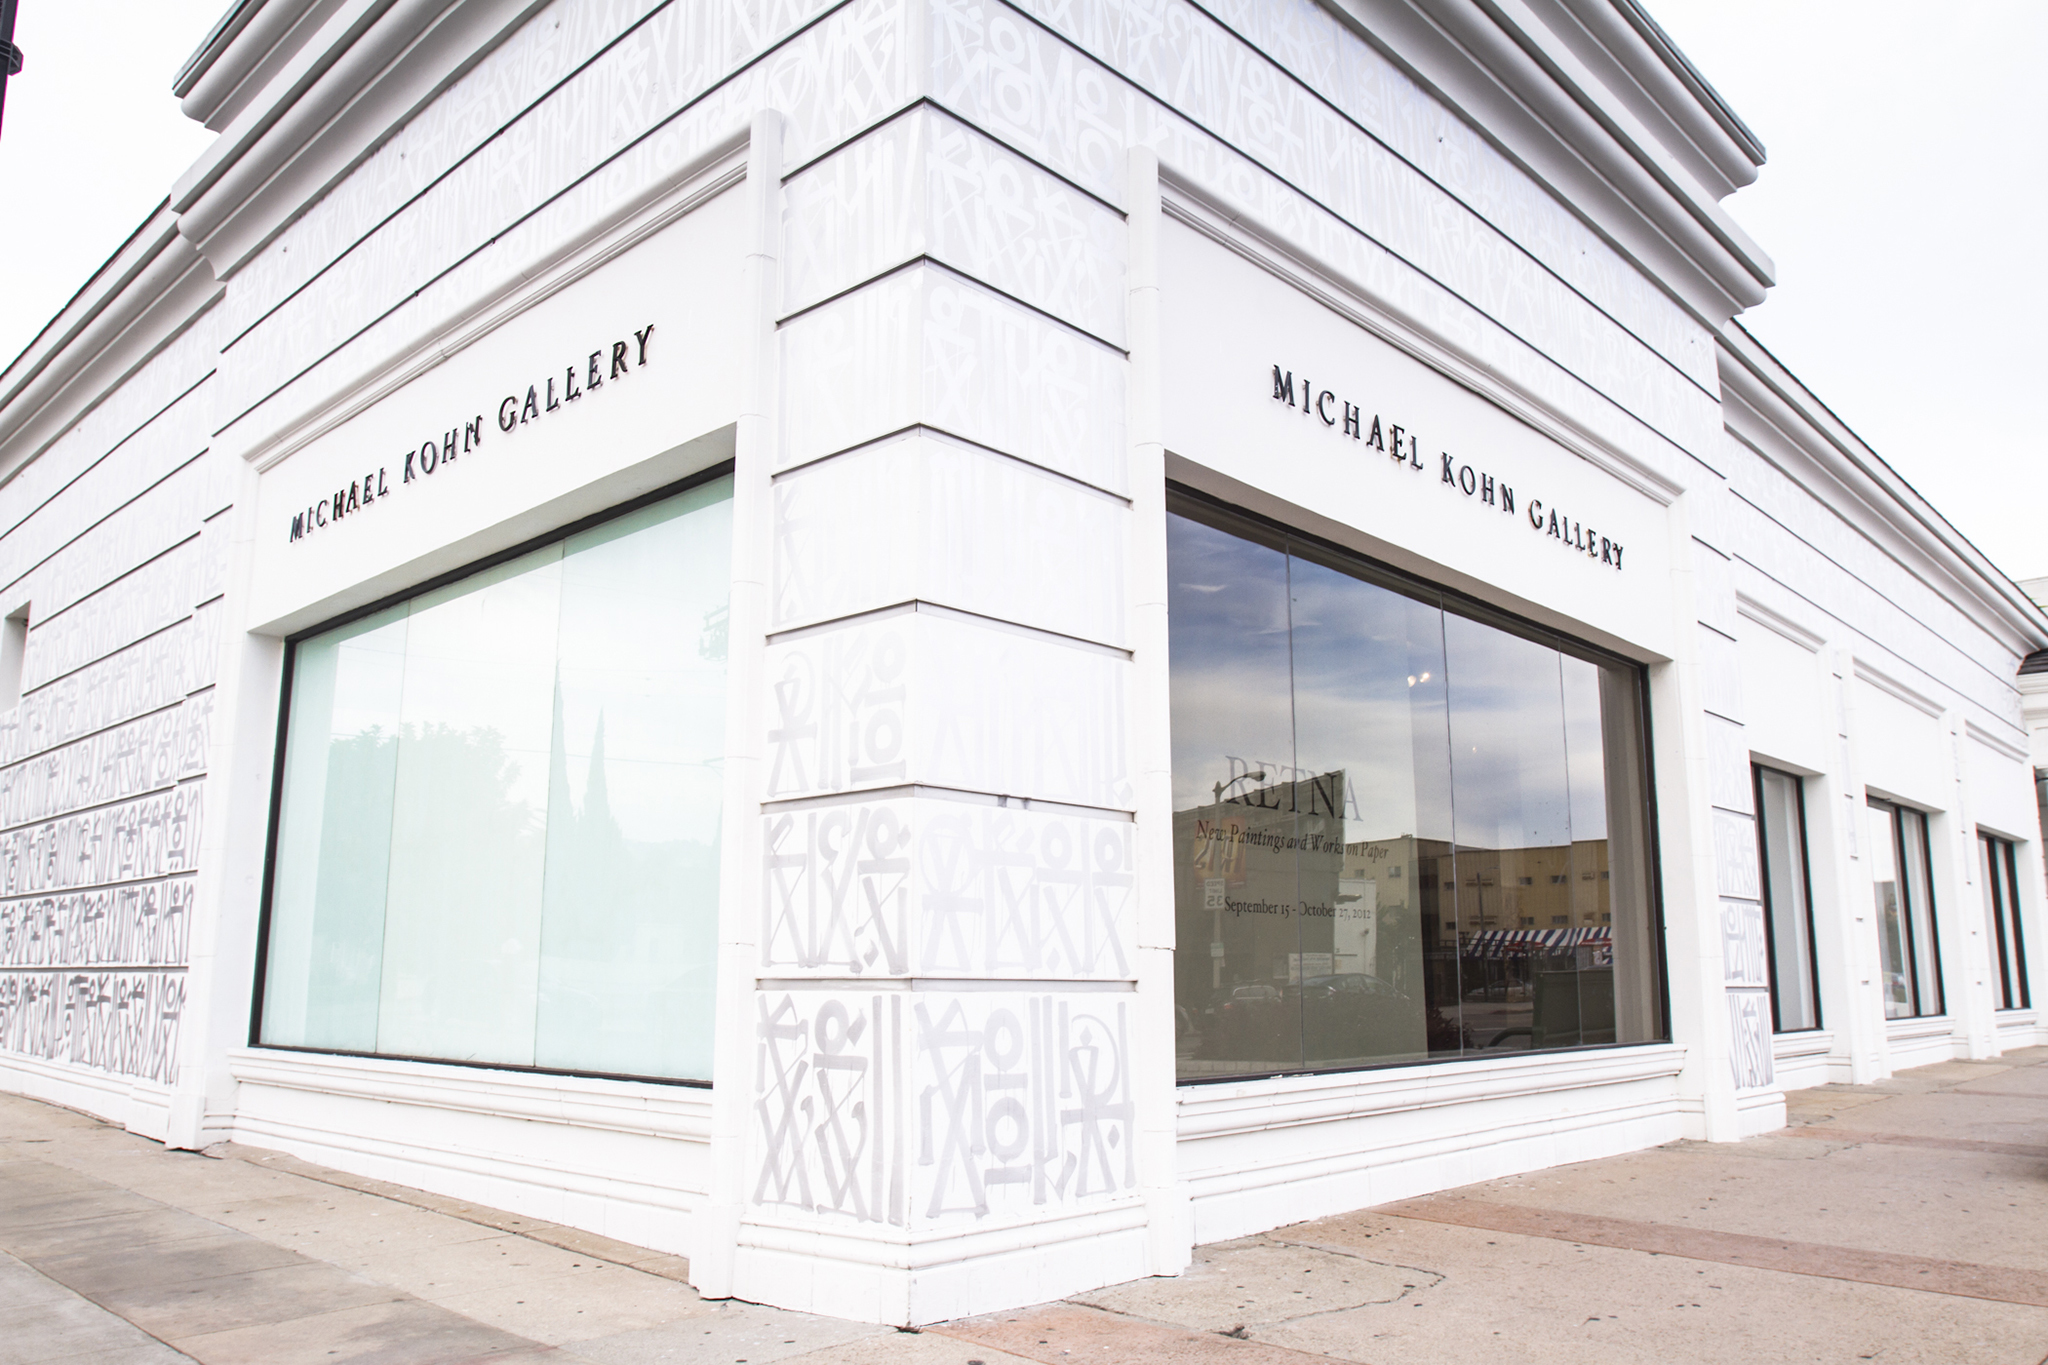 LA's most stylish galleries